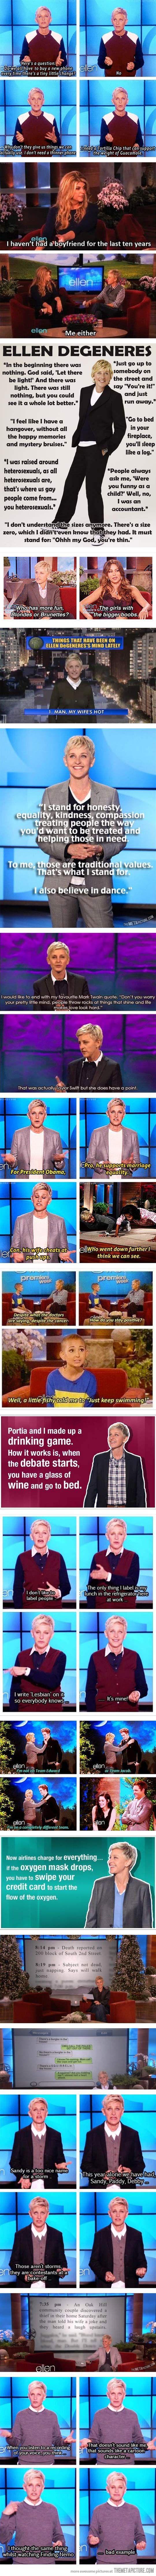 Gotta love Ellen!